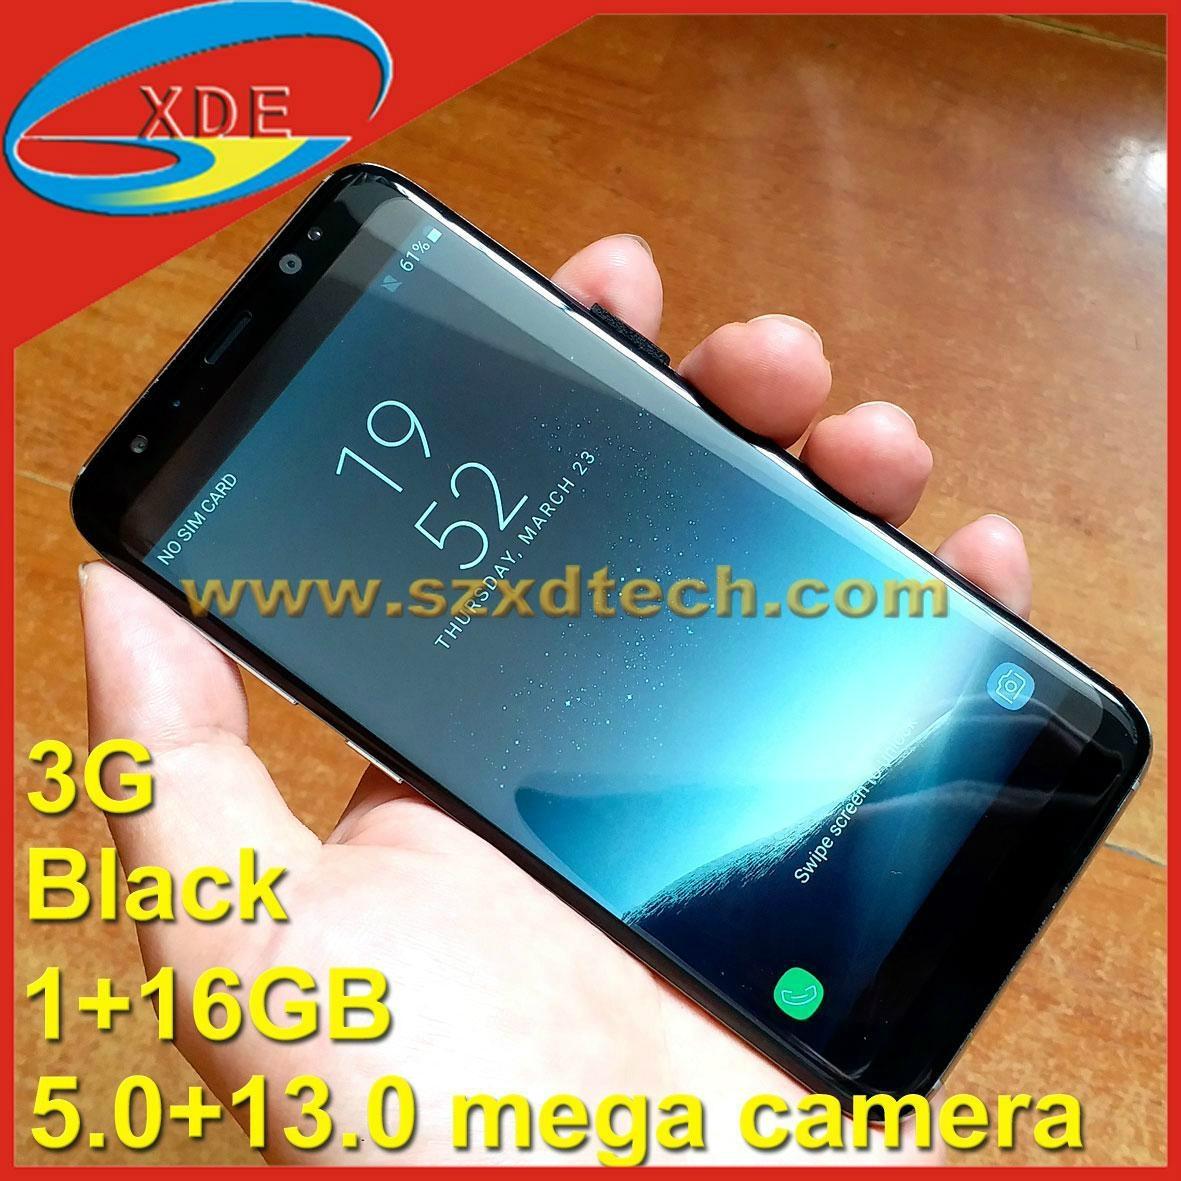 Latest Samsung S8 Edge Samsung Galaxy S8 Clone 3G 1+16GB